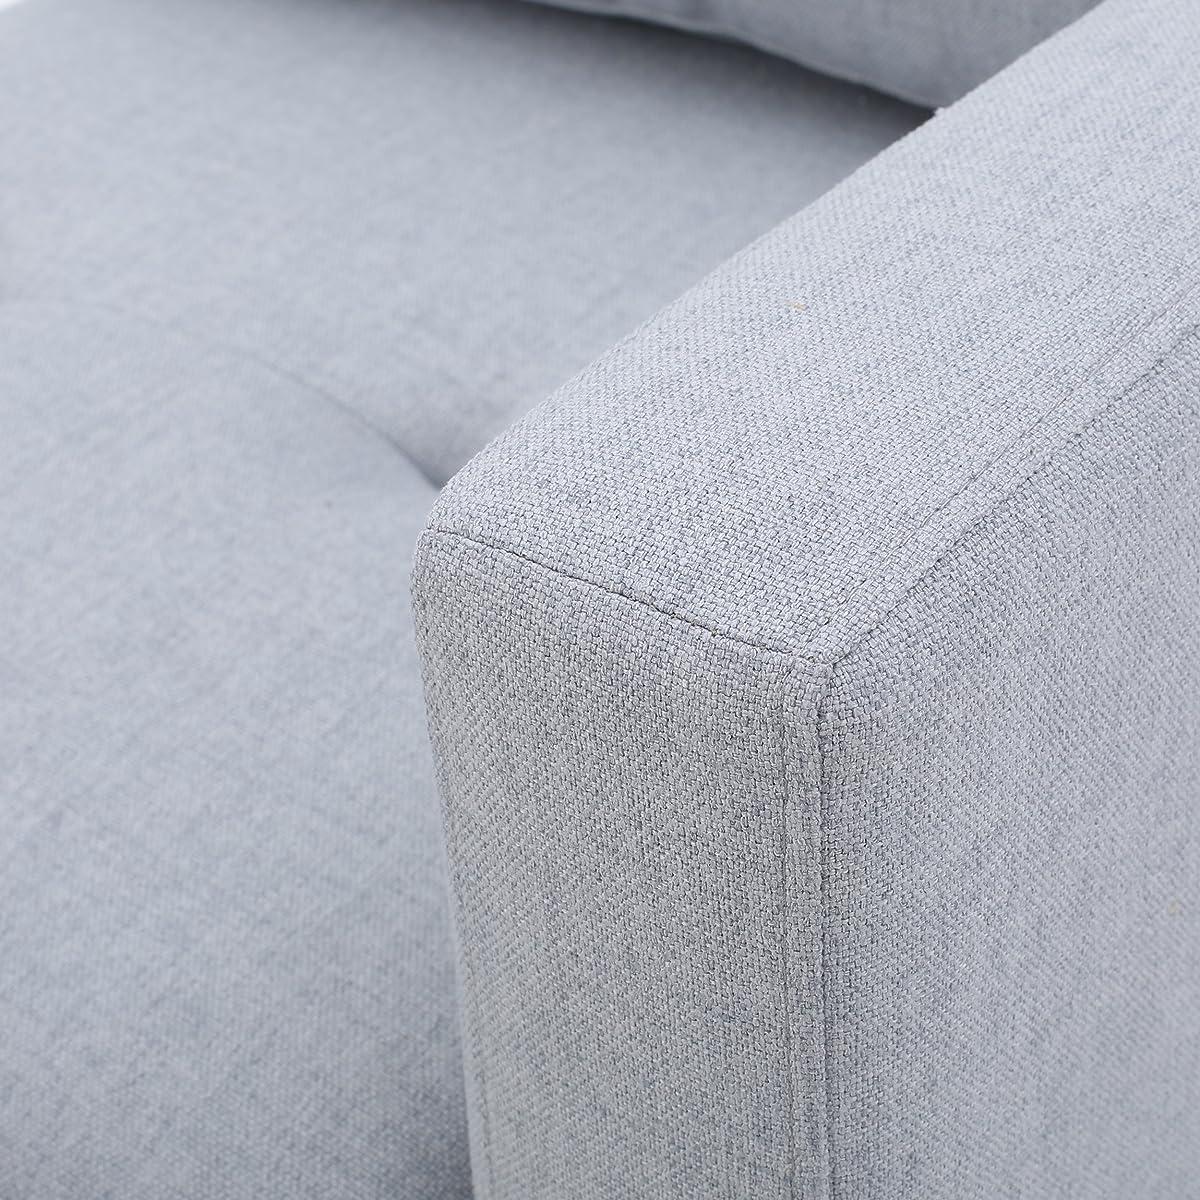 Carolina | Tufted Fabric Sectional Sofa | in Light Grey